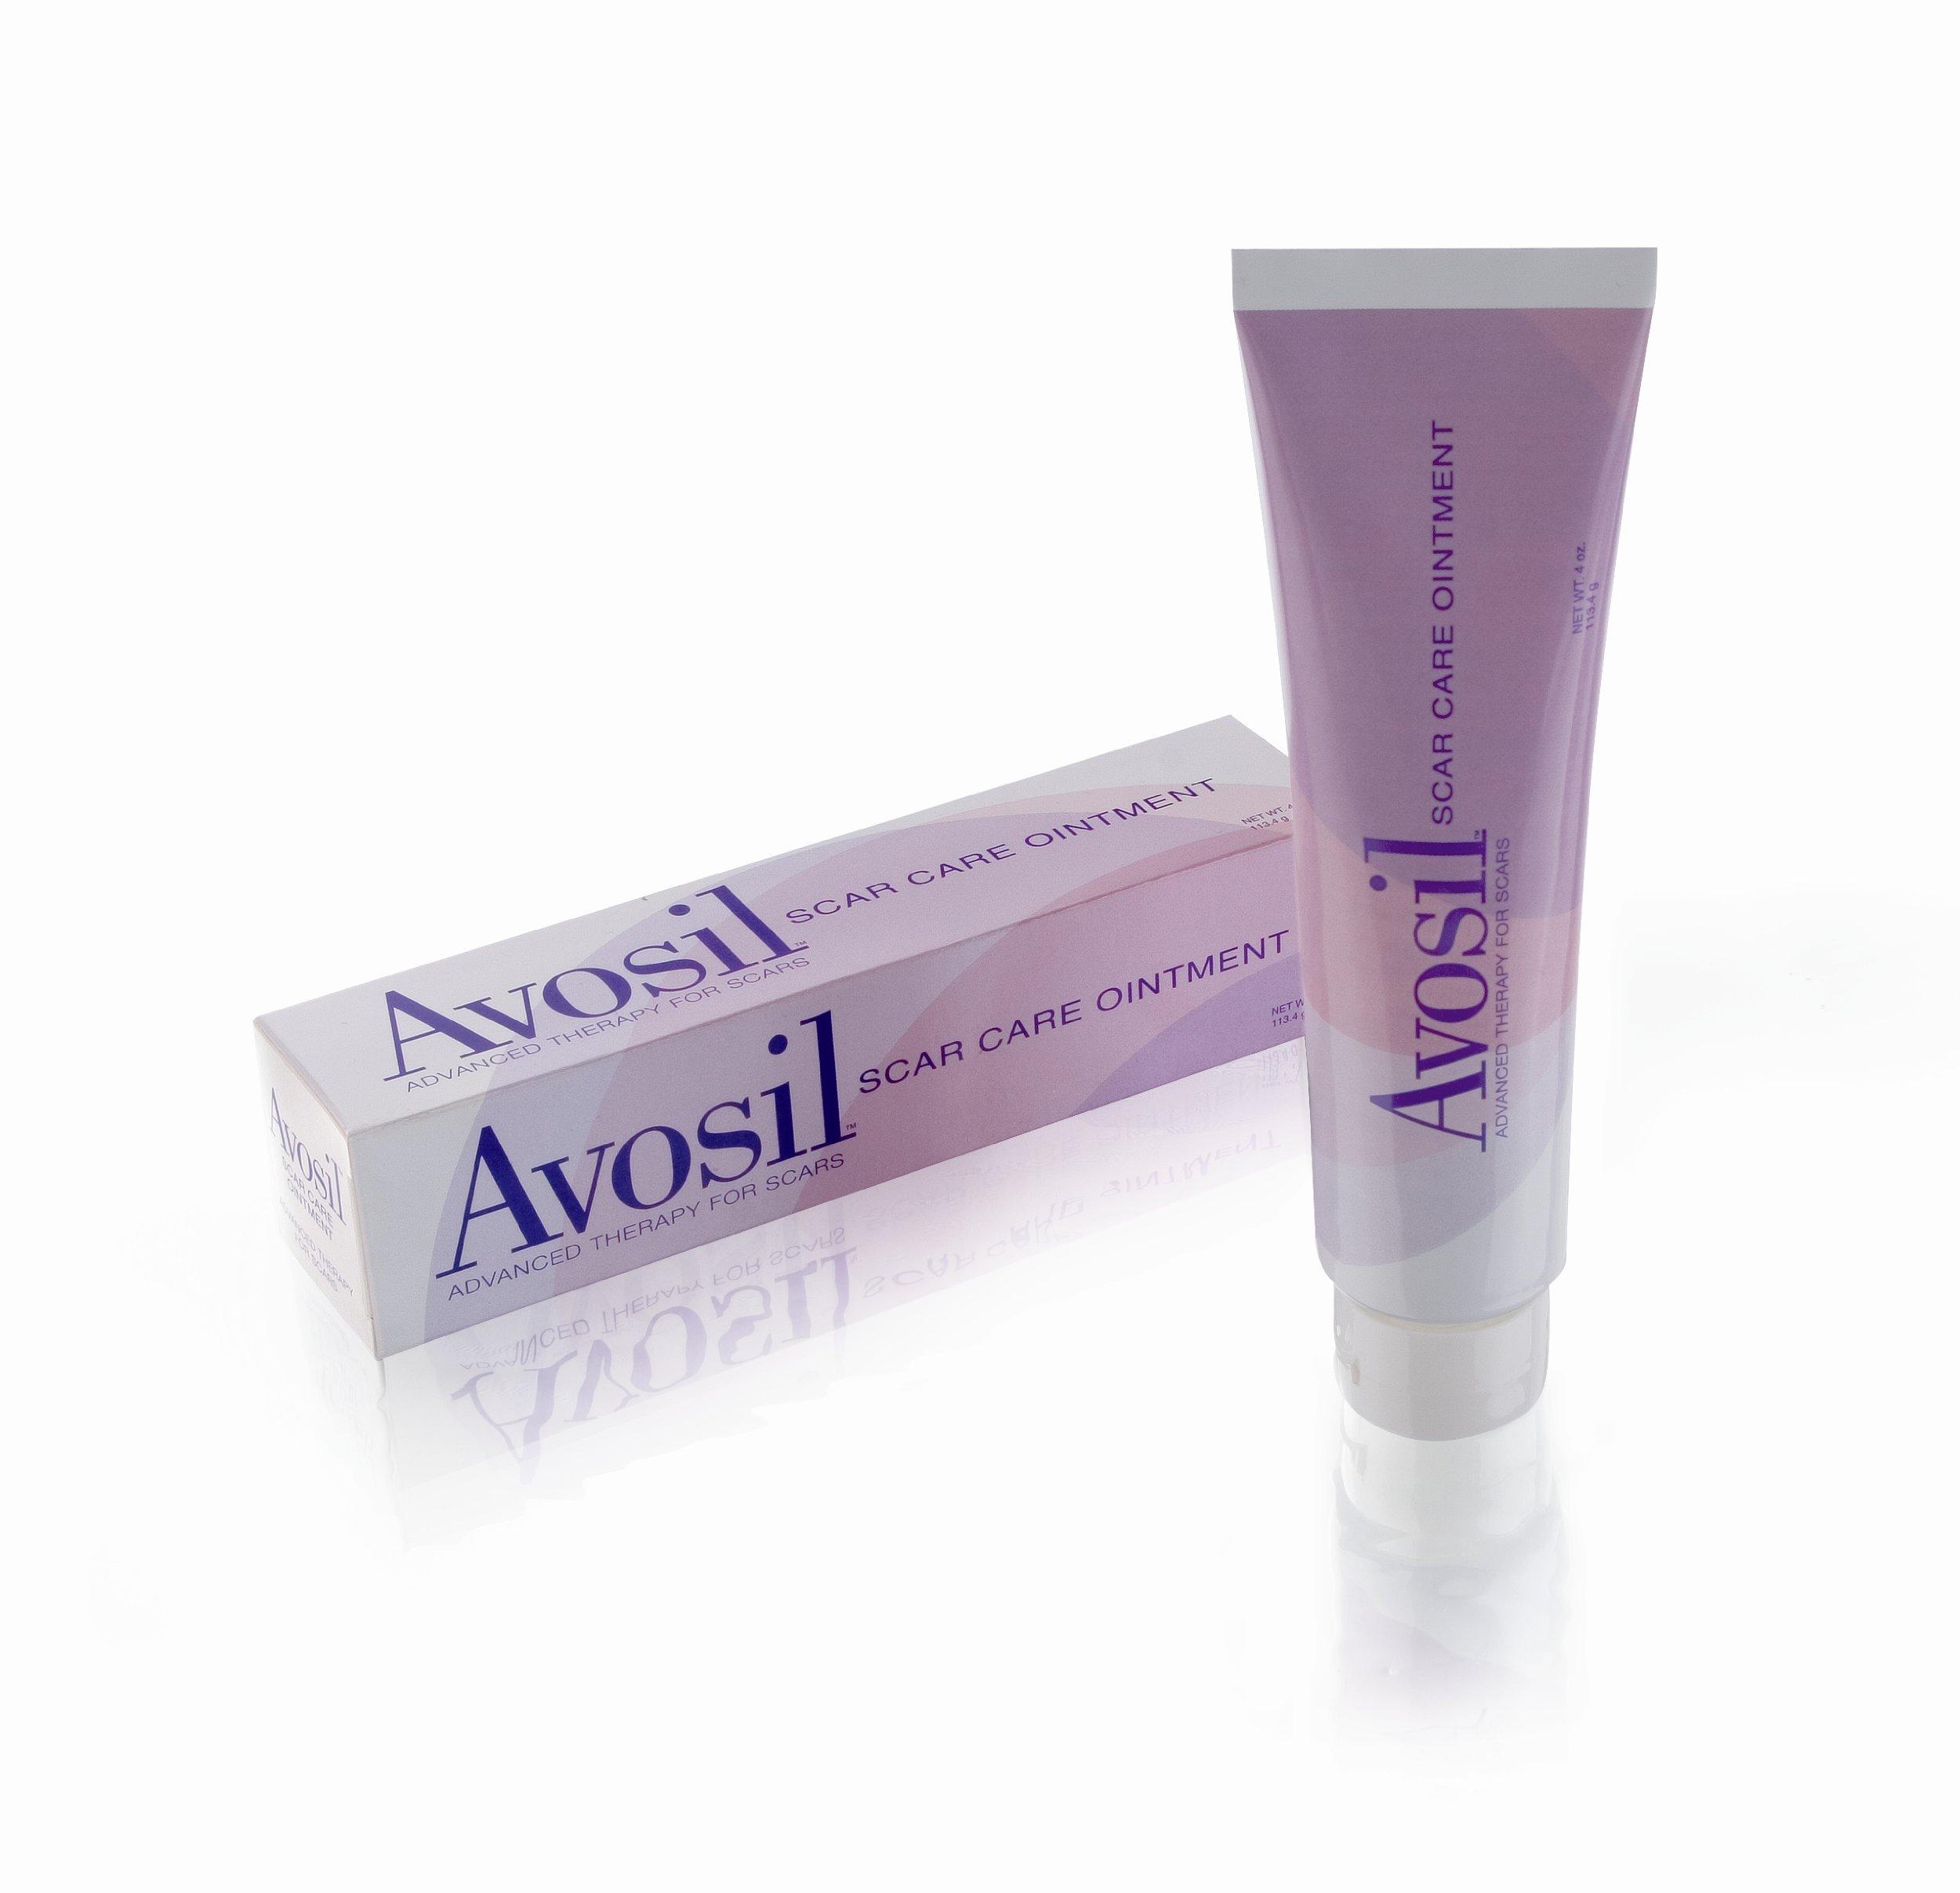 Avosil Scar Care Ointment, 56.7 grams by Avosil